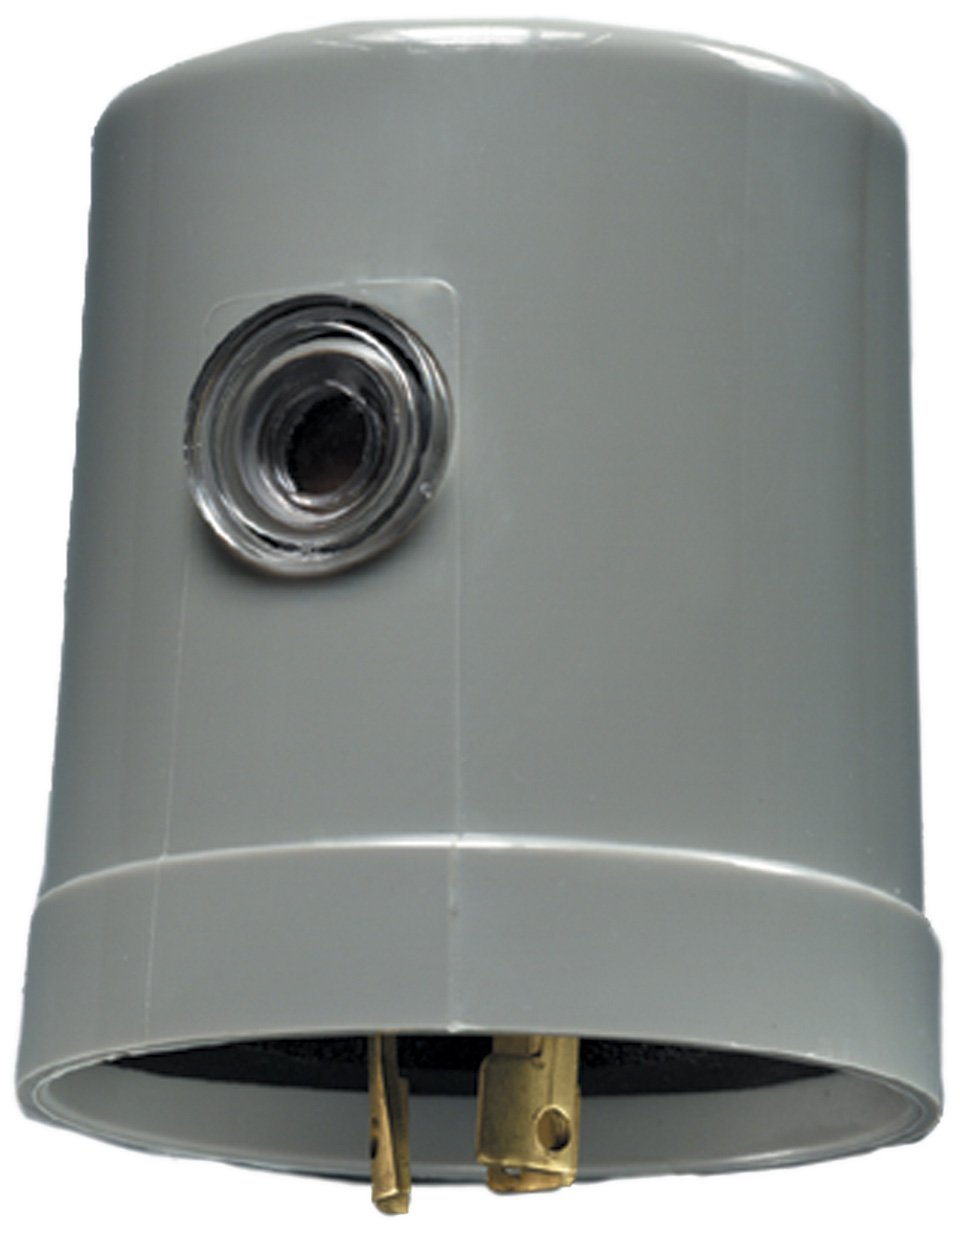 Intermatic K4521 120-Volt Photocontrols with Locking Type Mounting